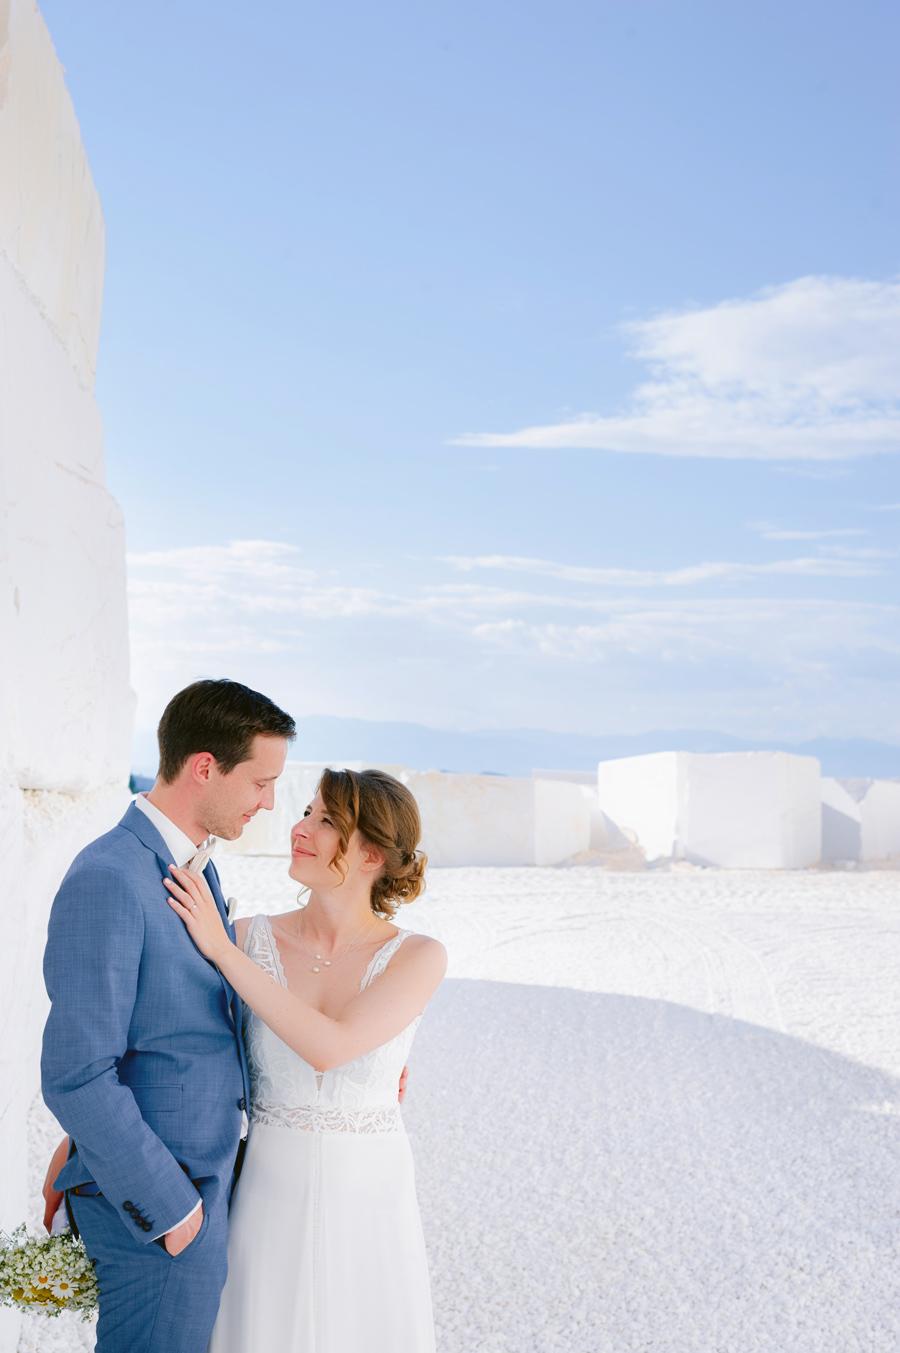 Dimi & Catherin's Wedding at Thasos